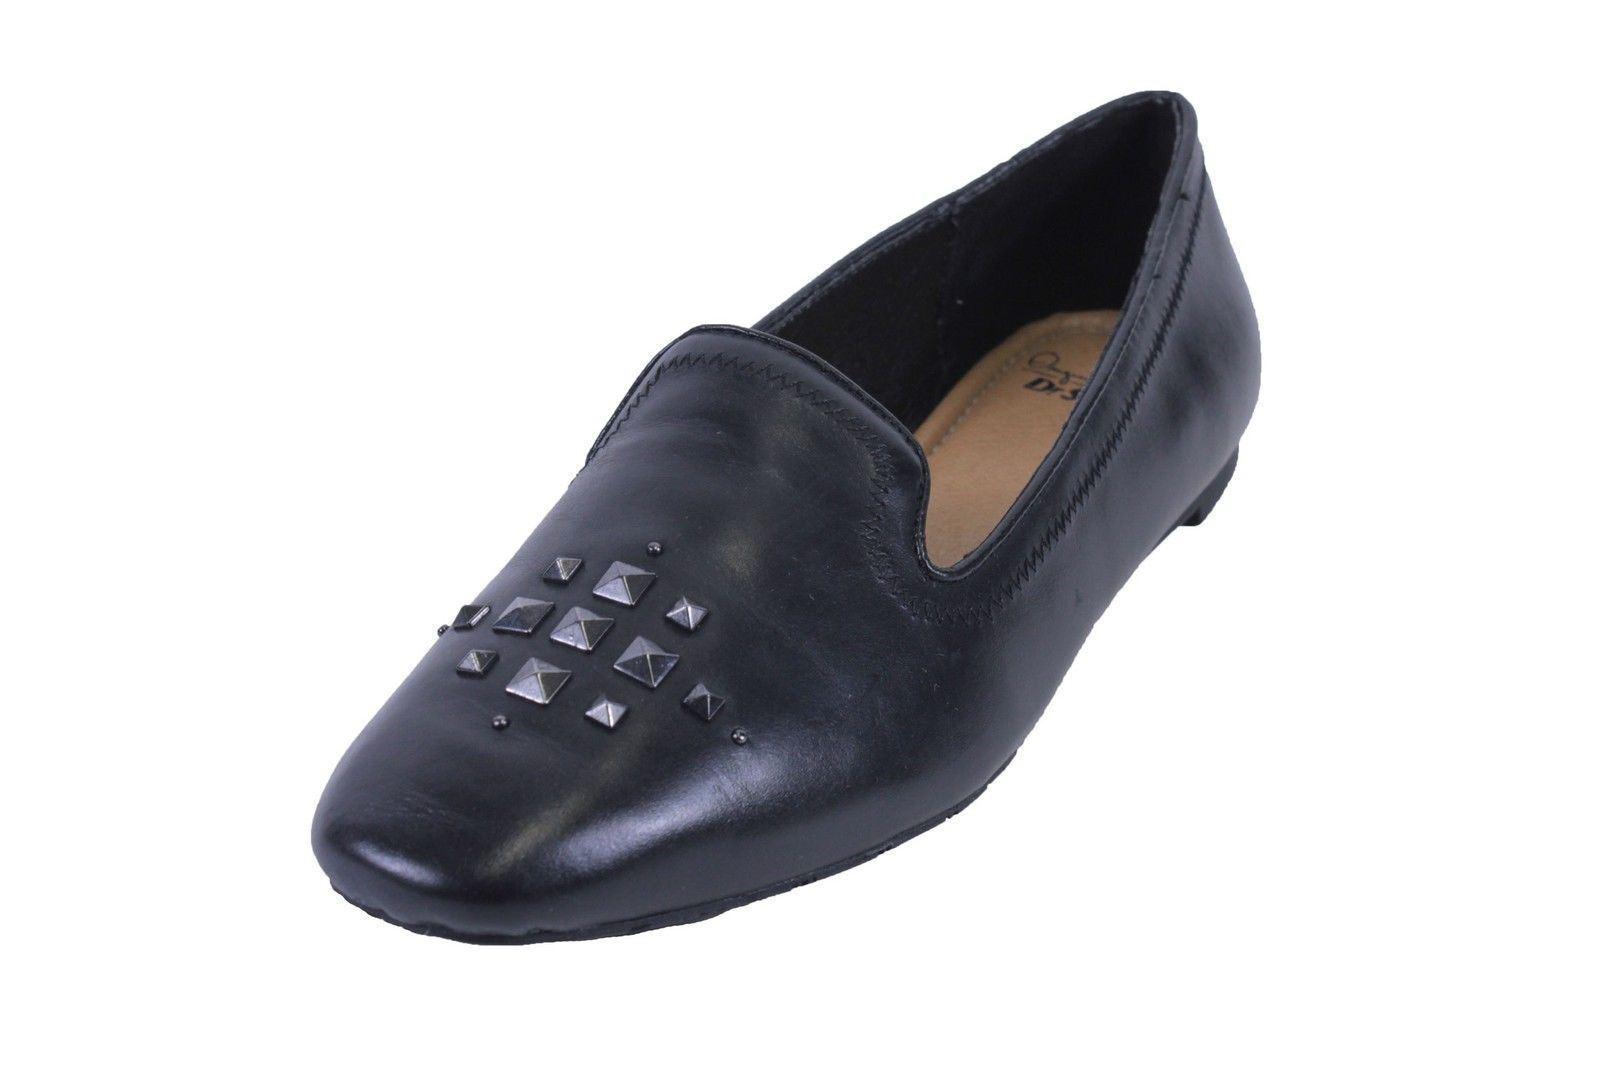 $34.99 - NEW Original Collection by Dr. Scholl's Women's Deltoro Black Flats Sz 7.5